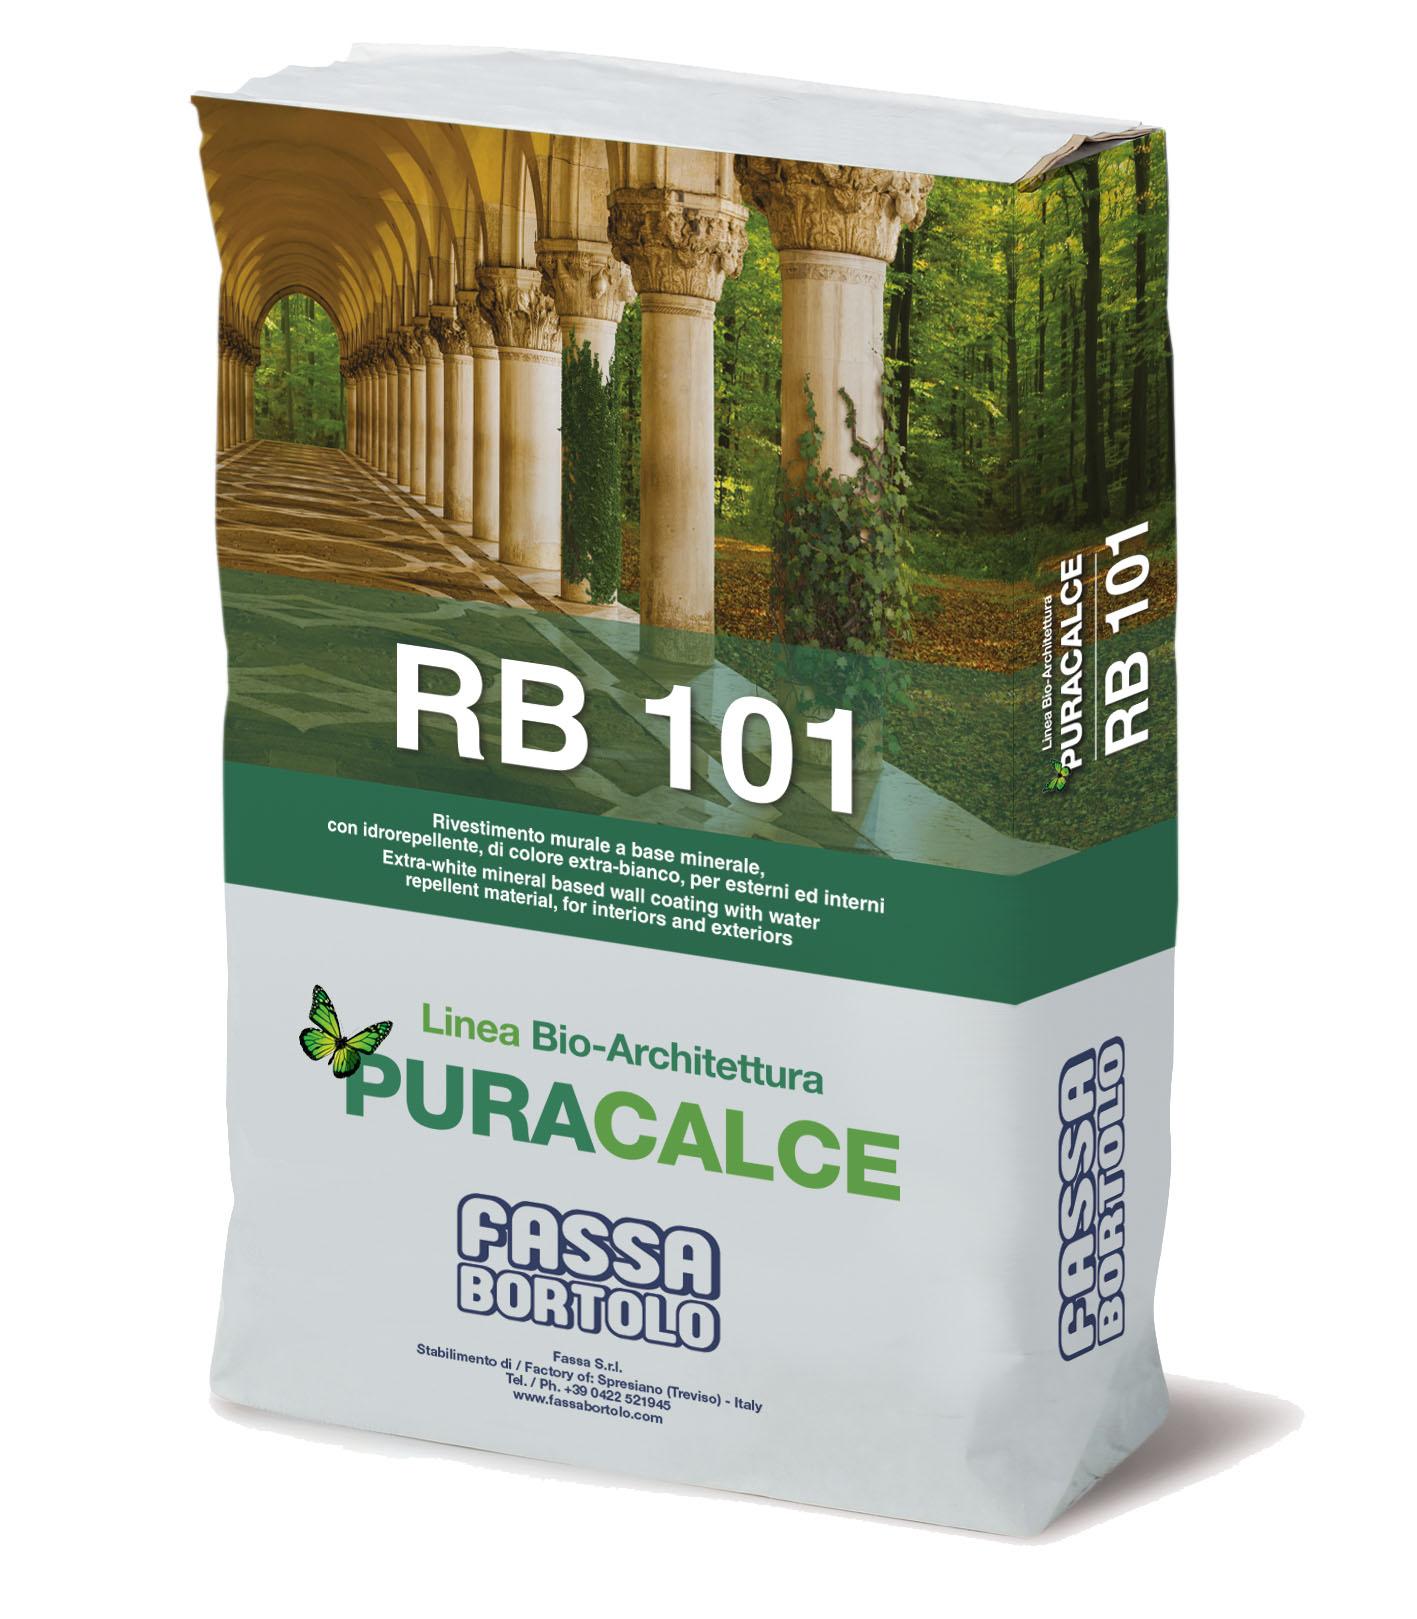 RB 101